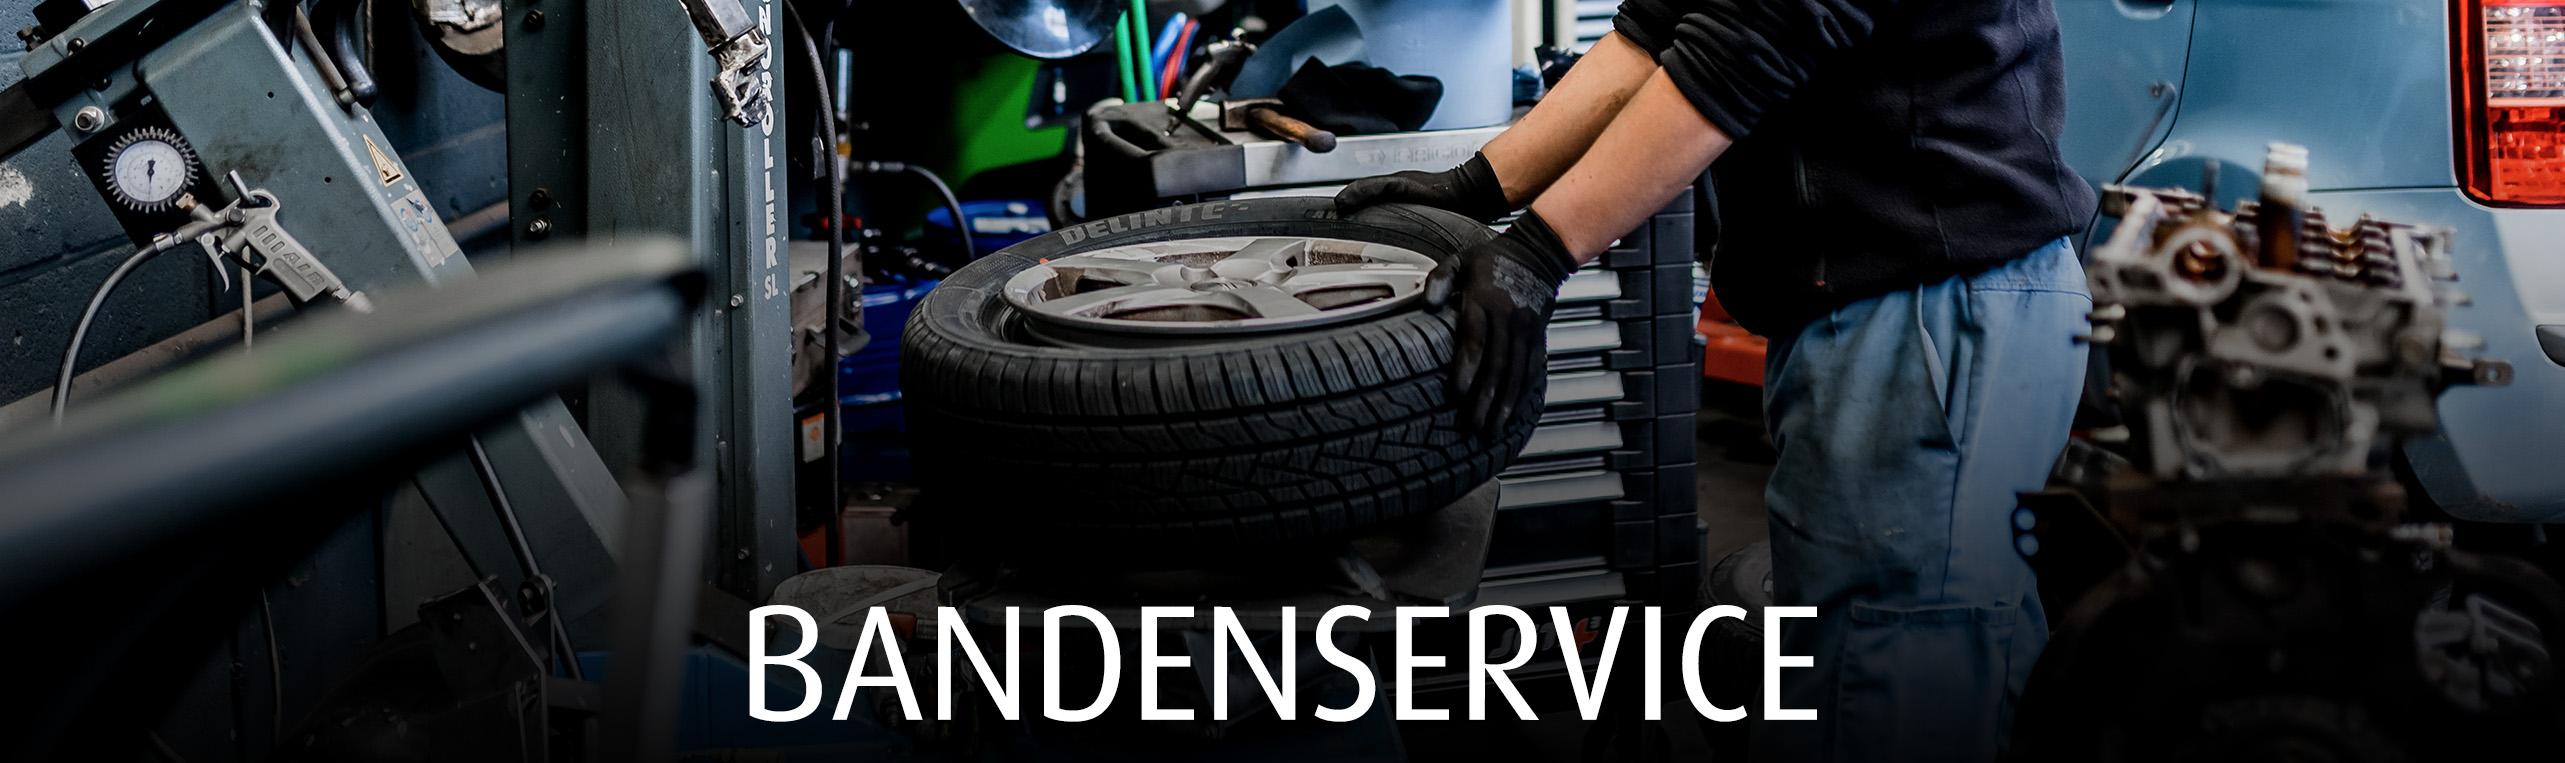 Bandenservice autobedrijf Jan Dodemont garage in Eijsden